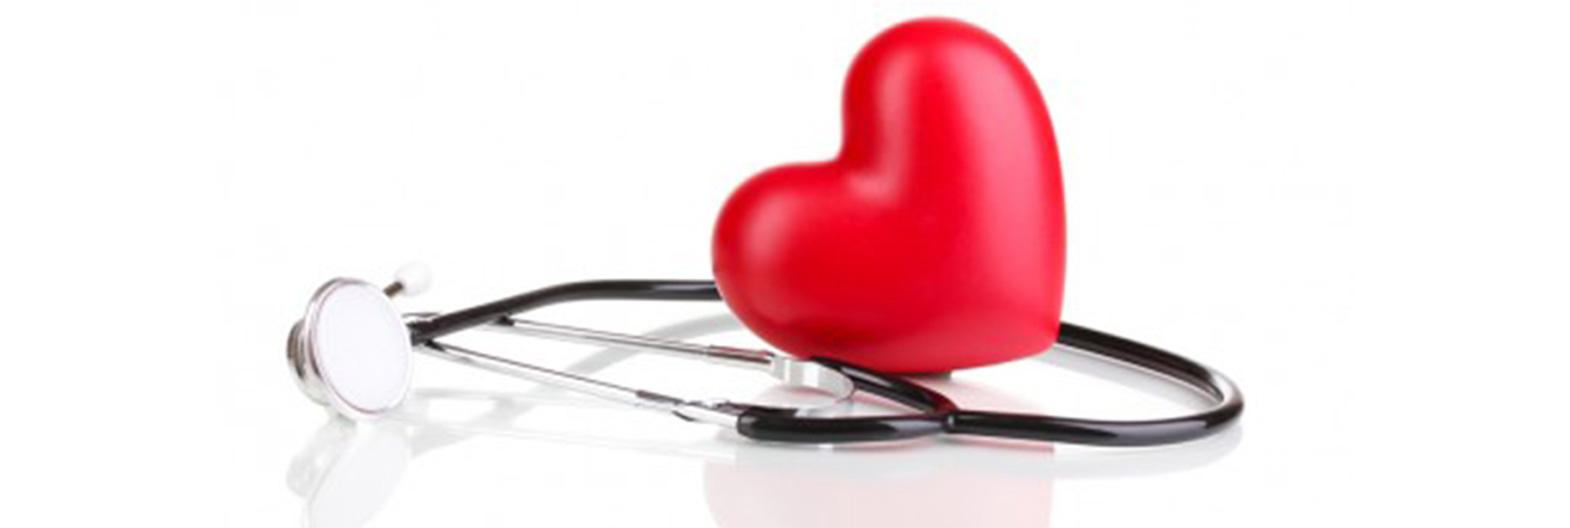 guašos masažas sergant hipertenzija